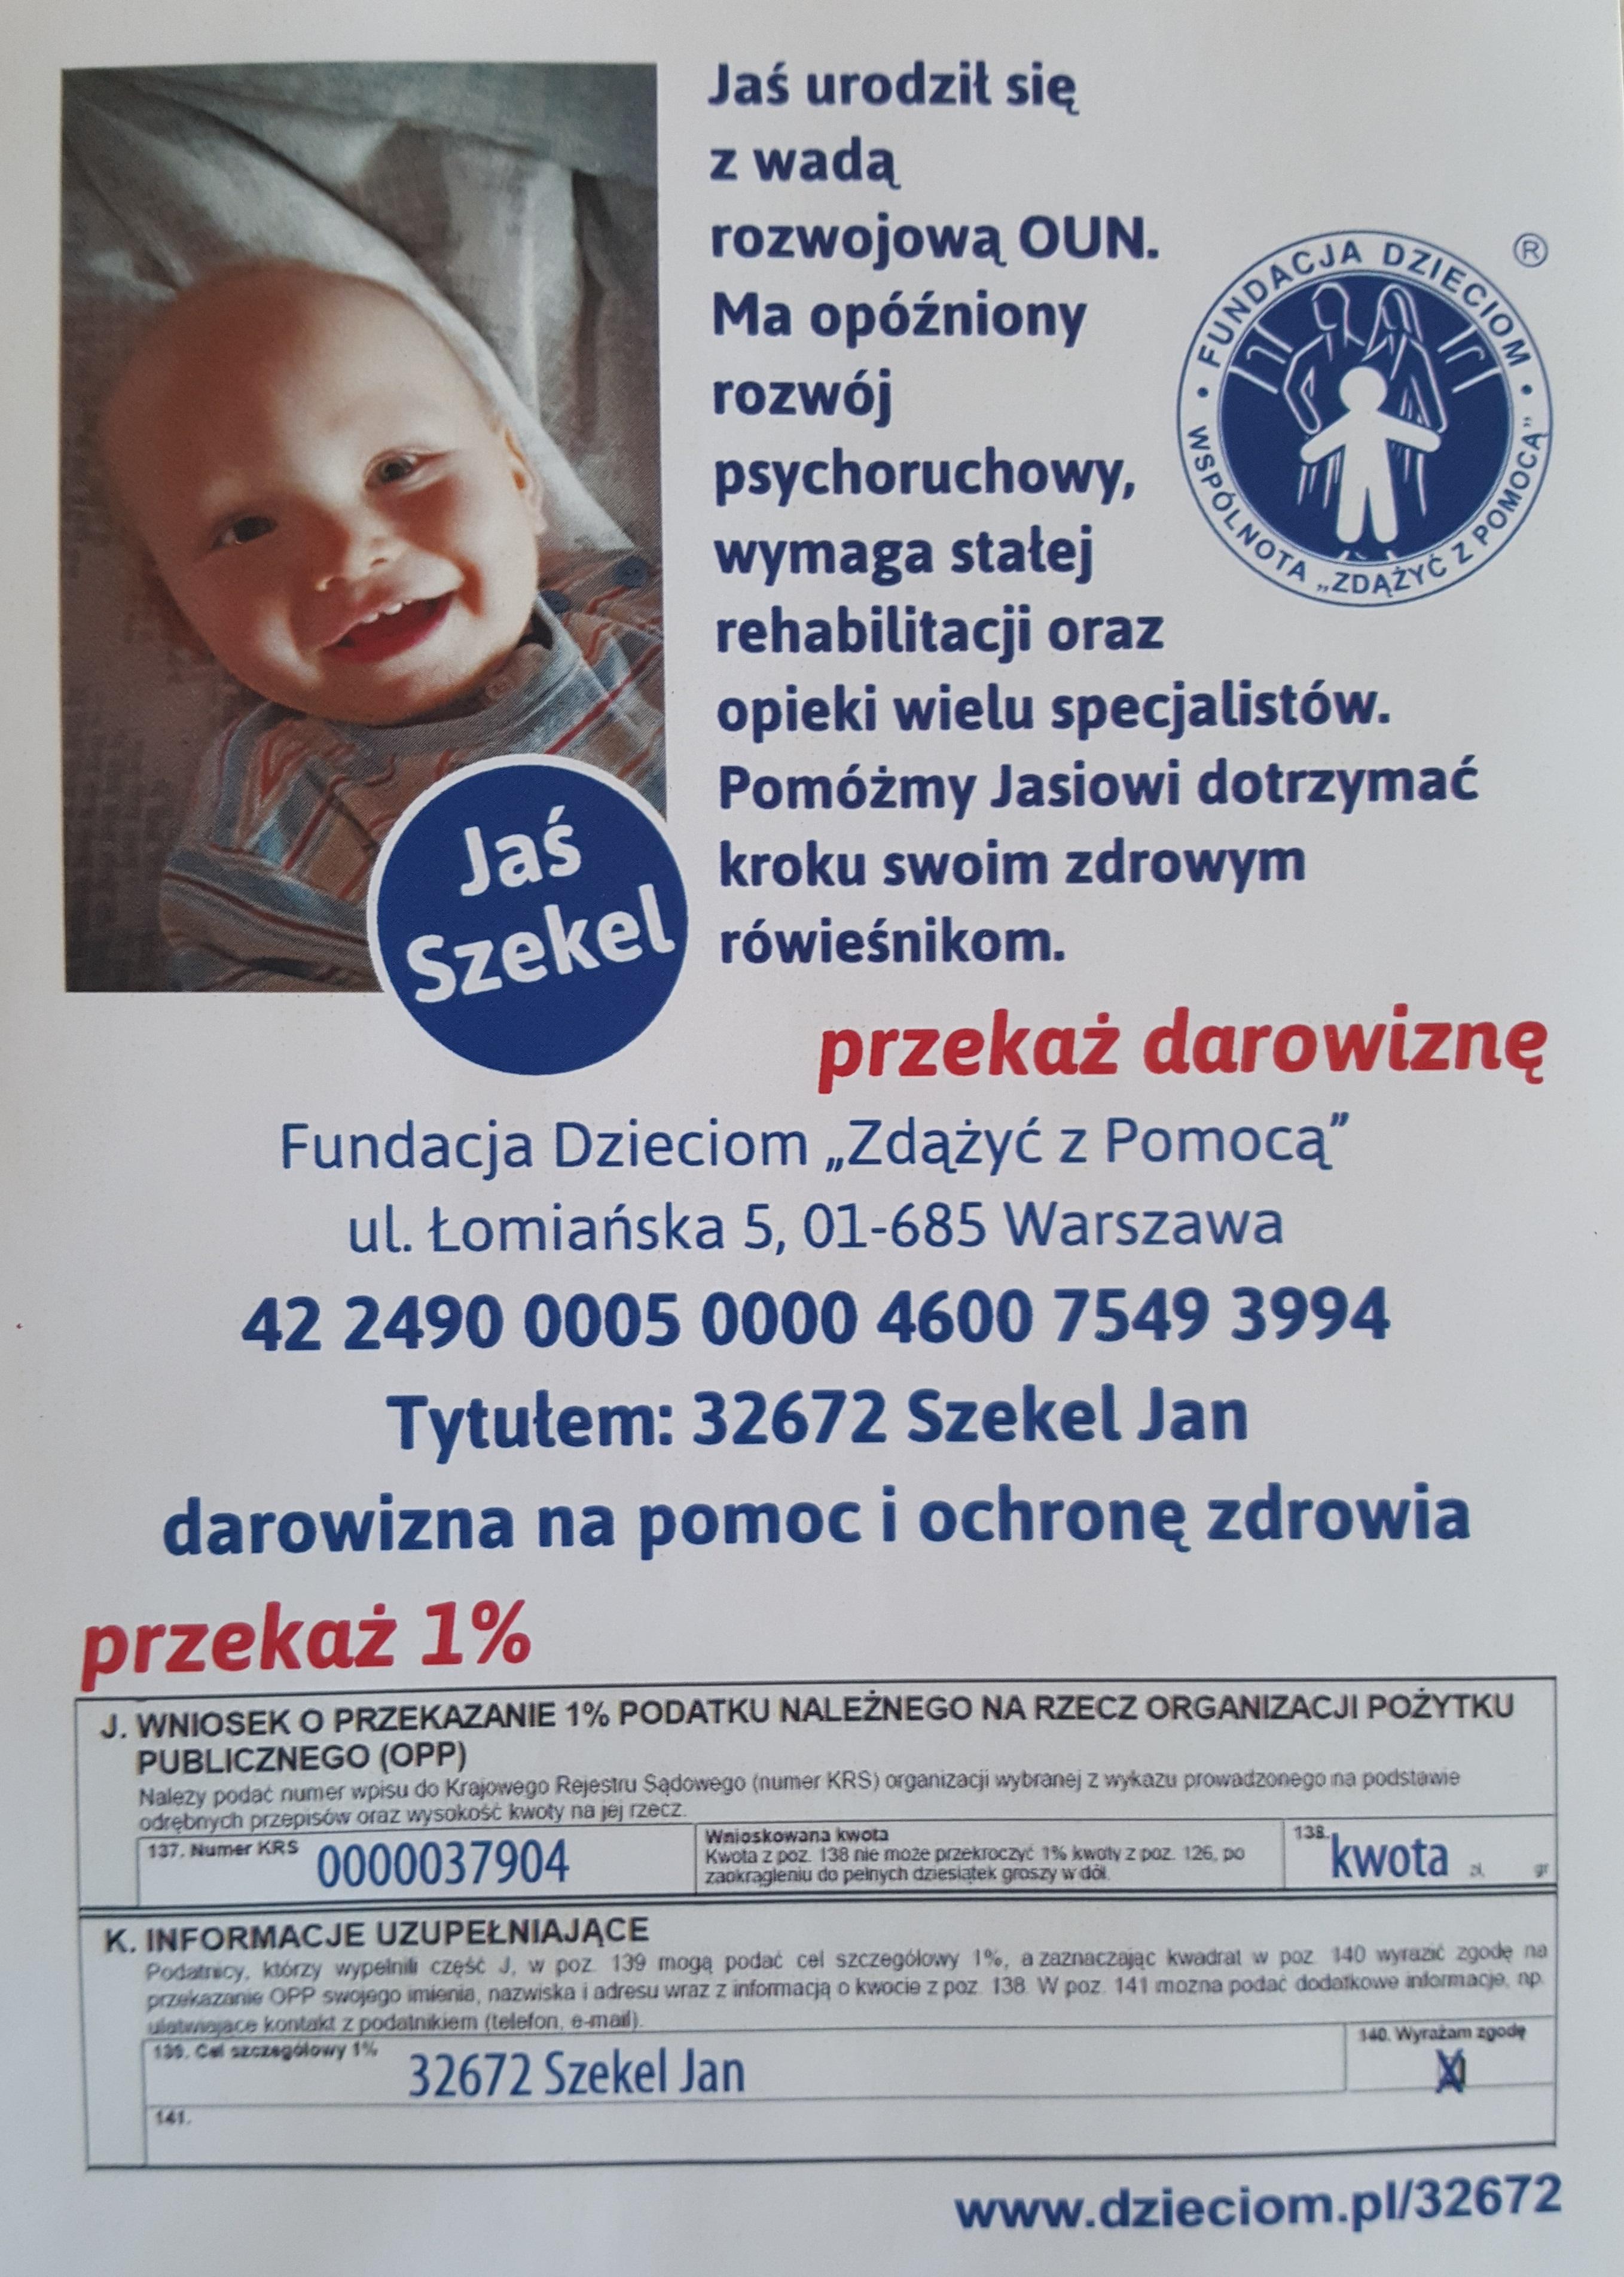 20180203_085619